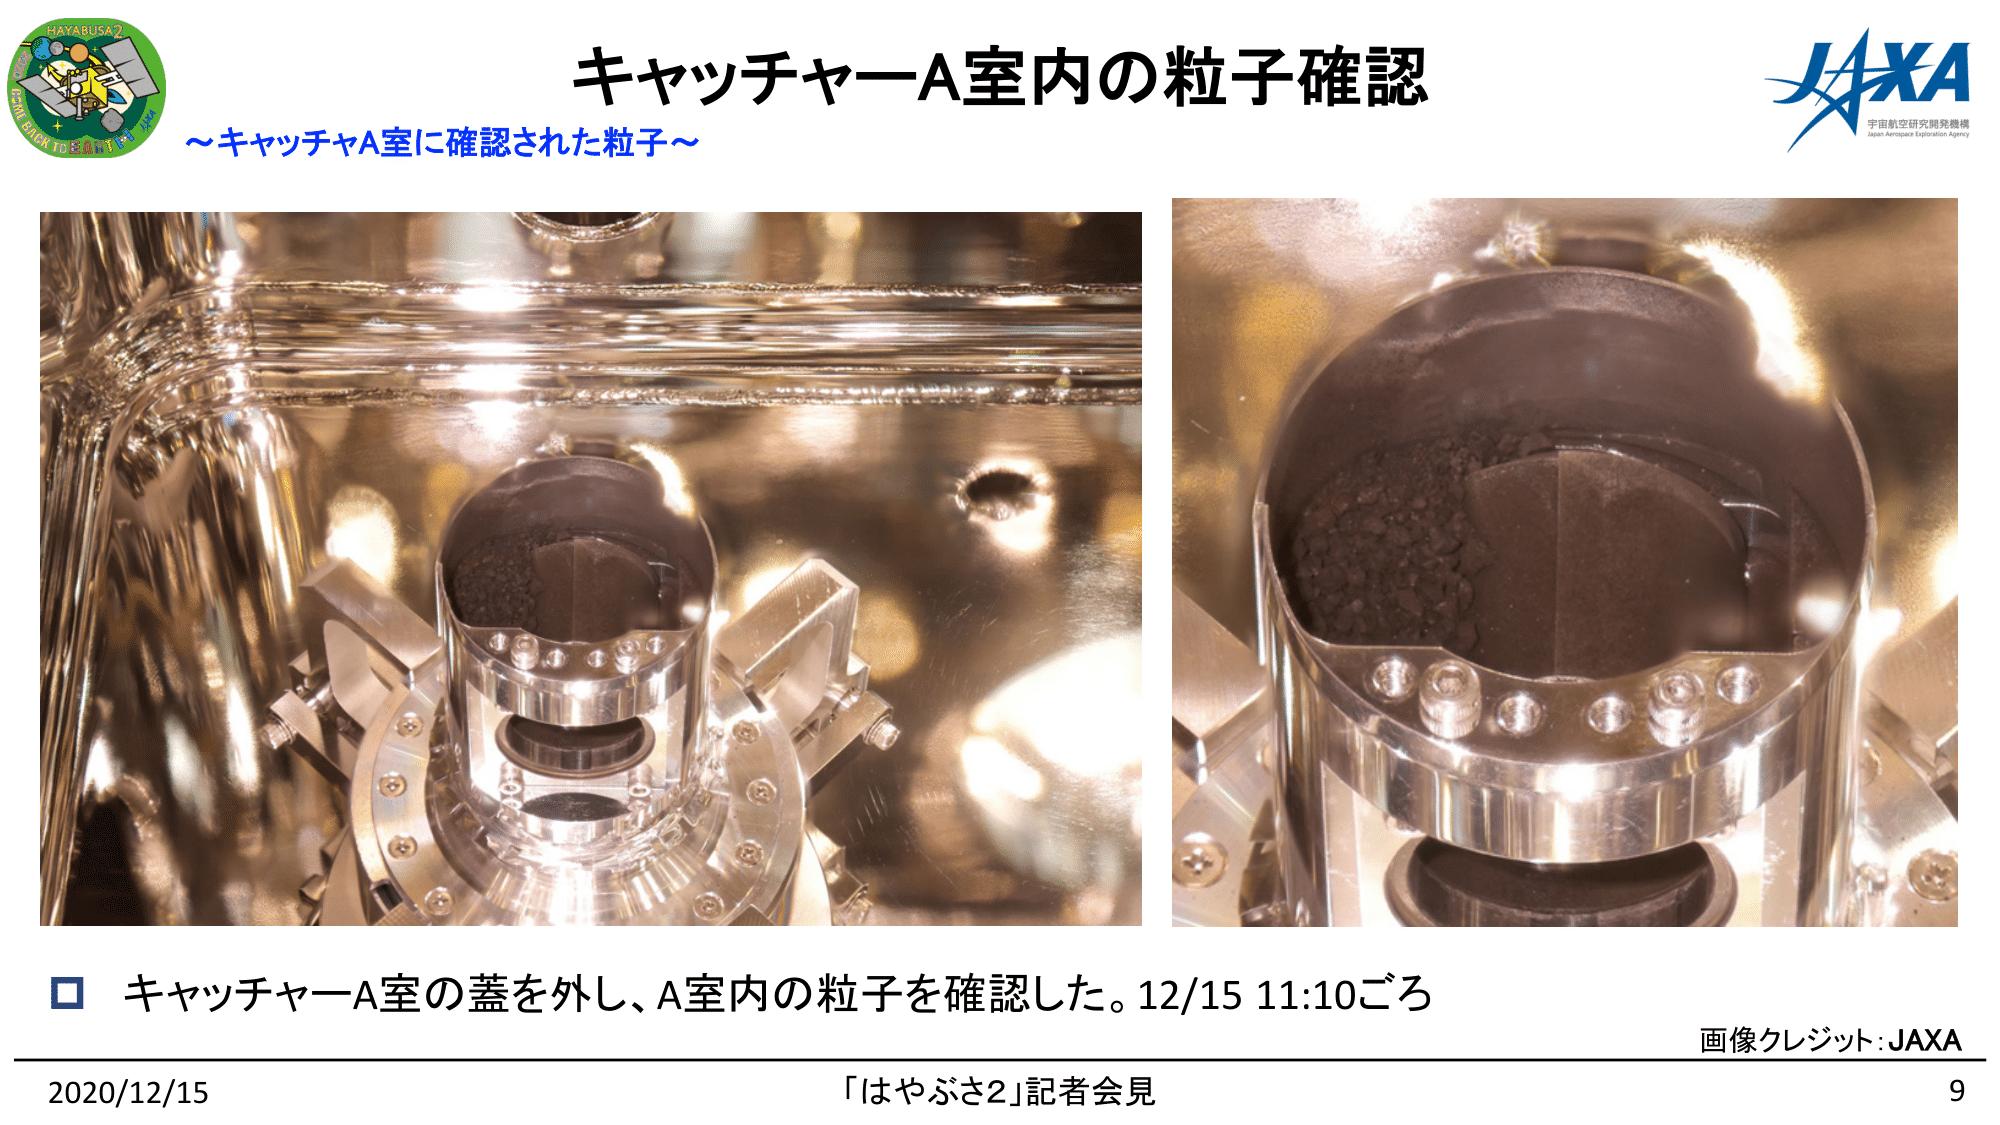 f:id:Imamura:20201215132100p:plain